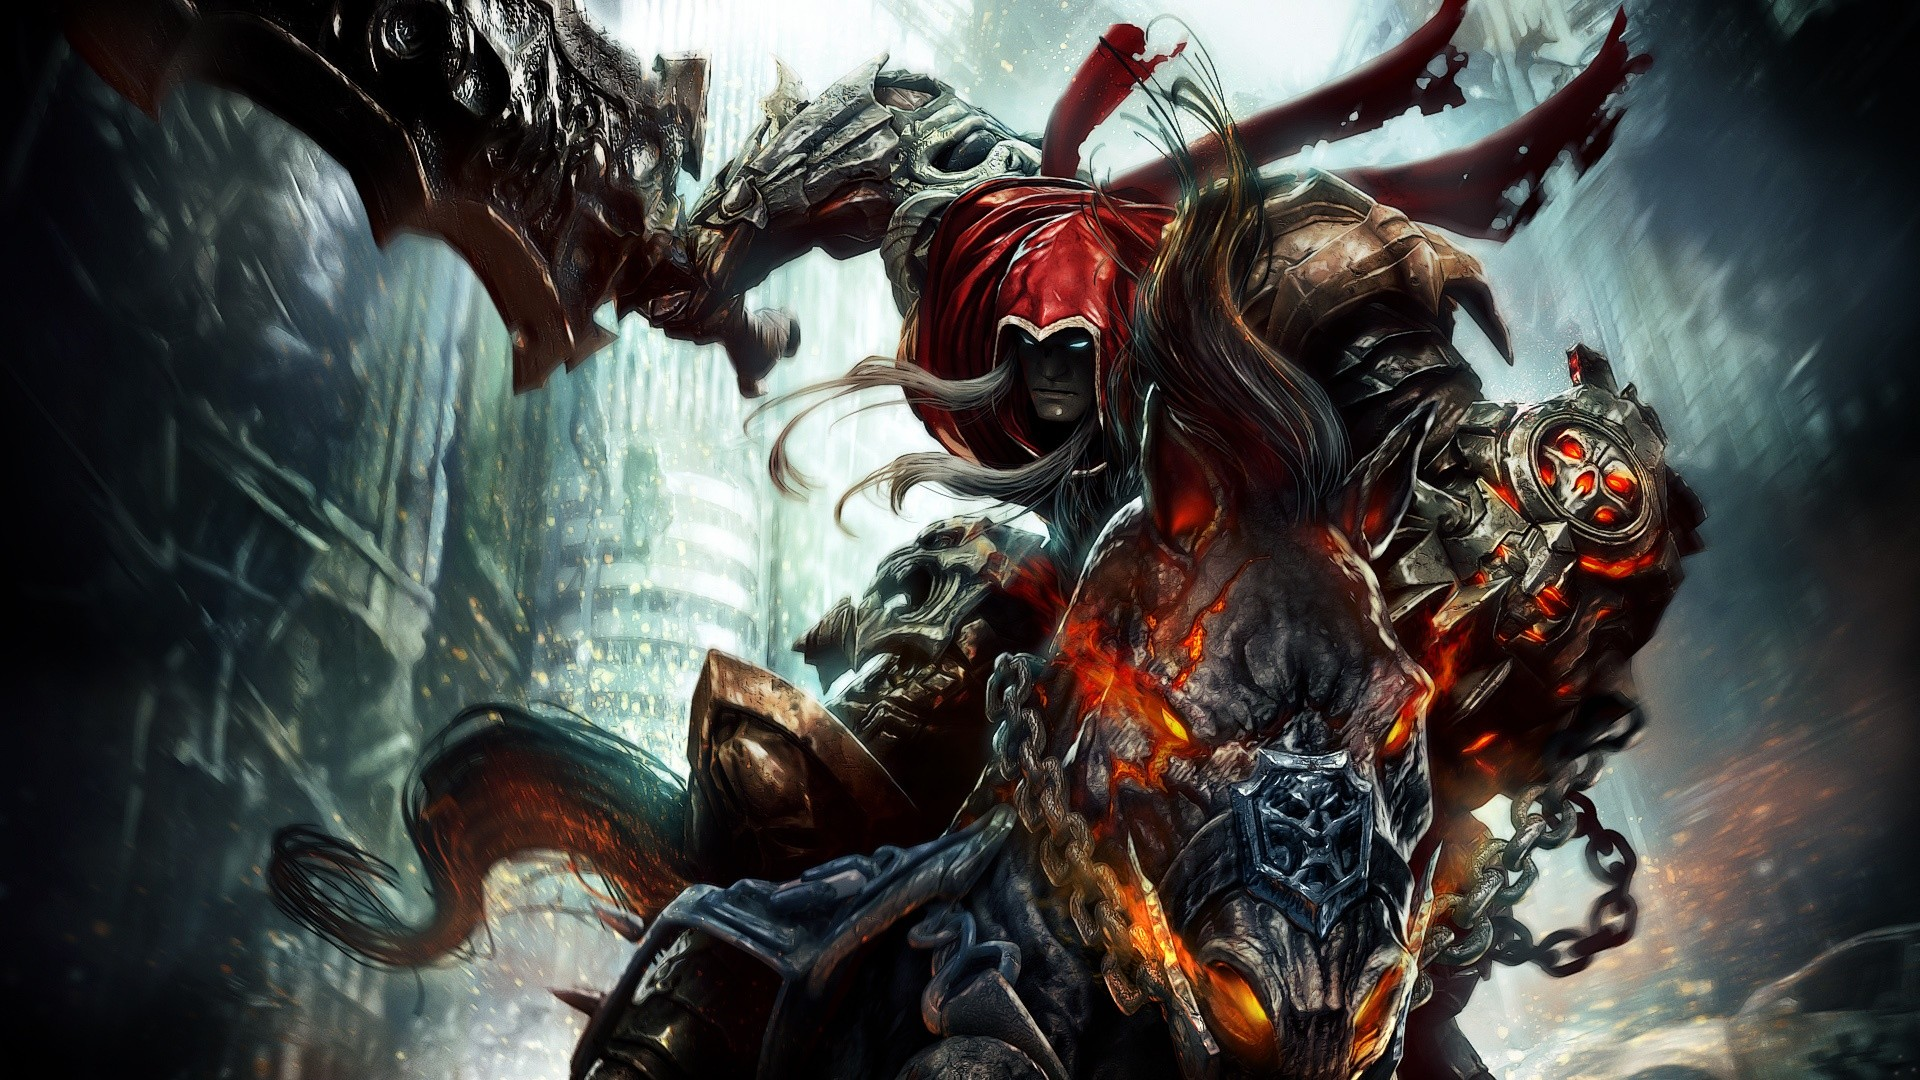 Video game wallpapers 1080p wallpapertag - Gaming wallpaper ...